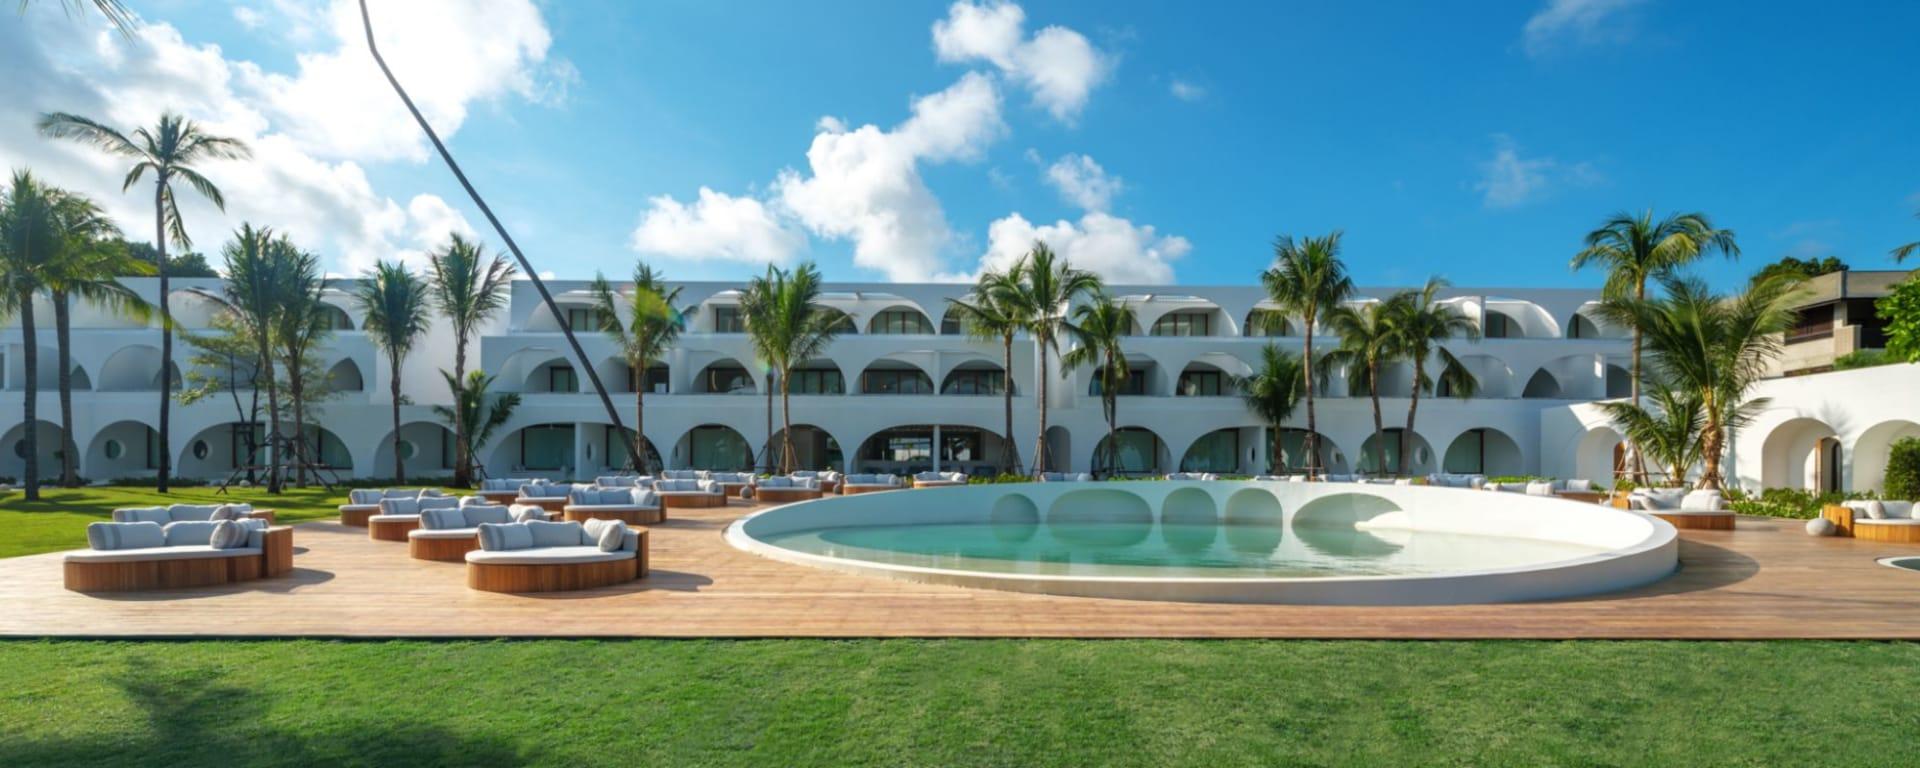 SALA Samui Chaweng Beach Resort in Ko Samui: Hotel view with pool